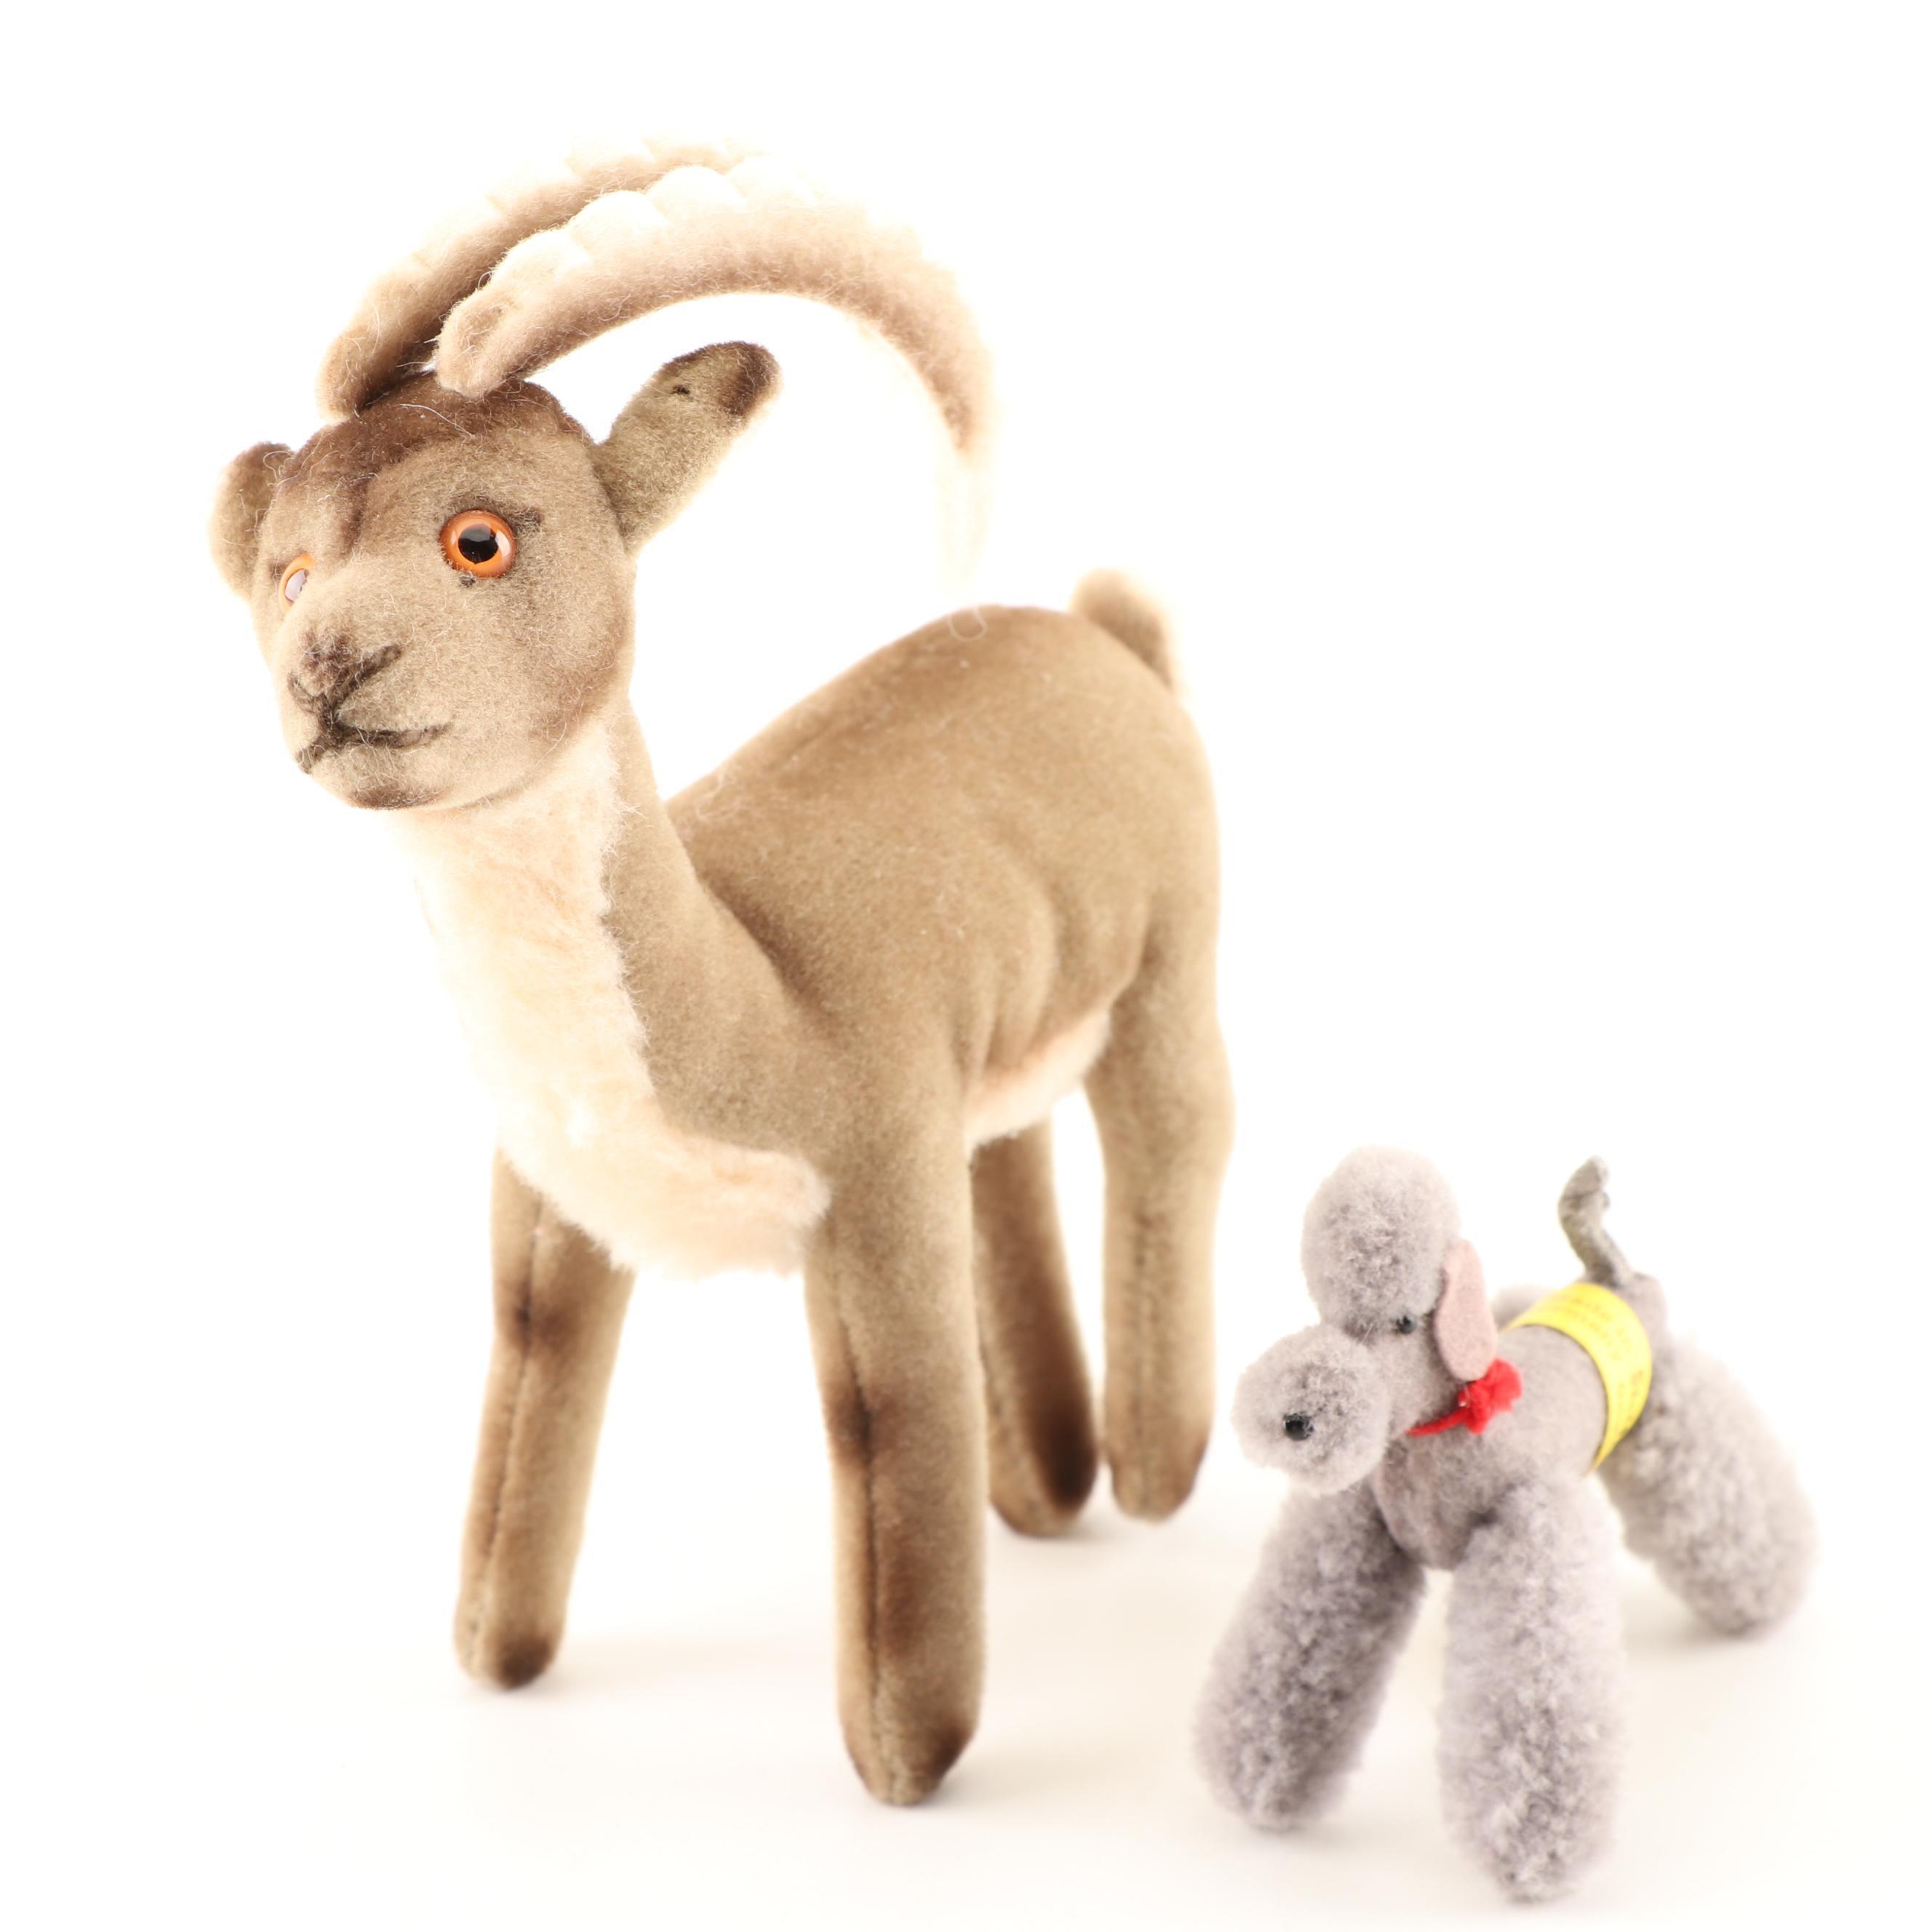 Plush Stuffed Animals Including Steiff